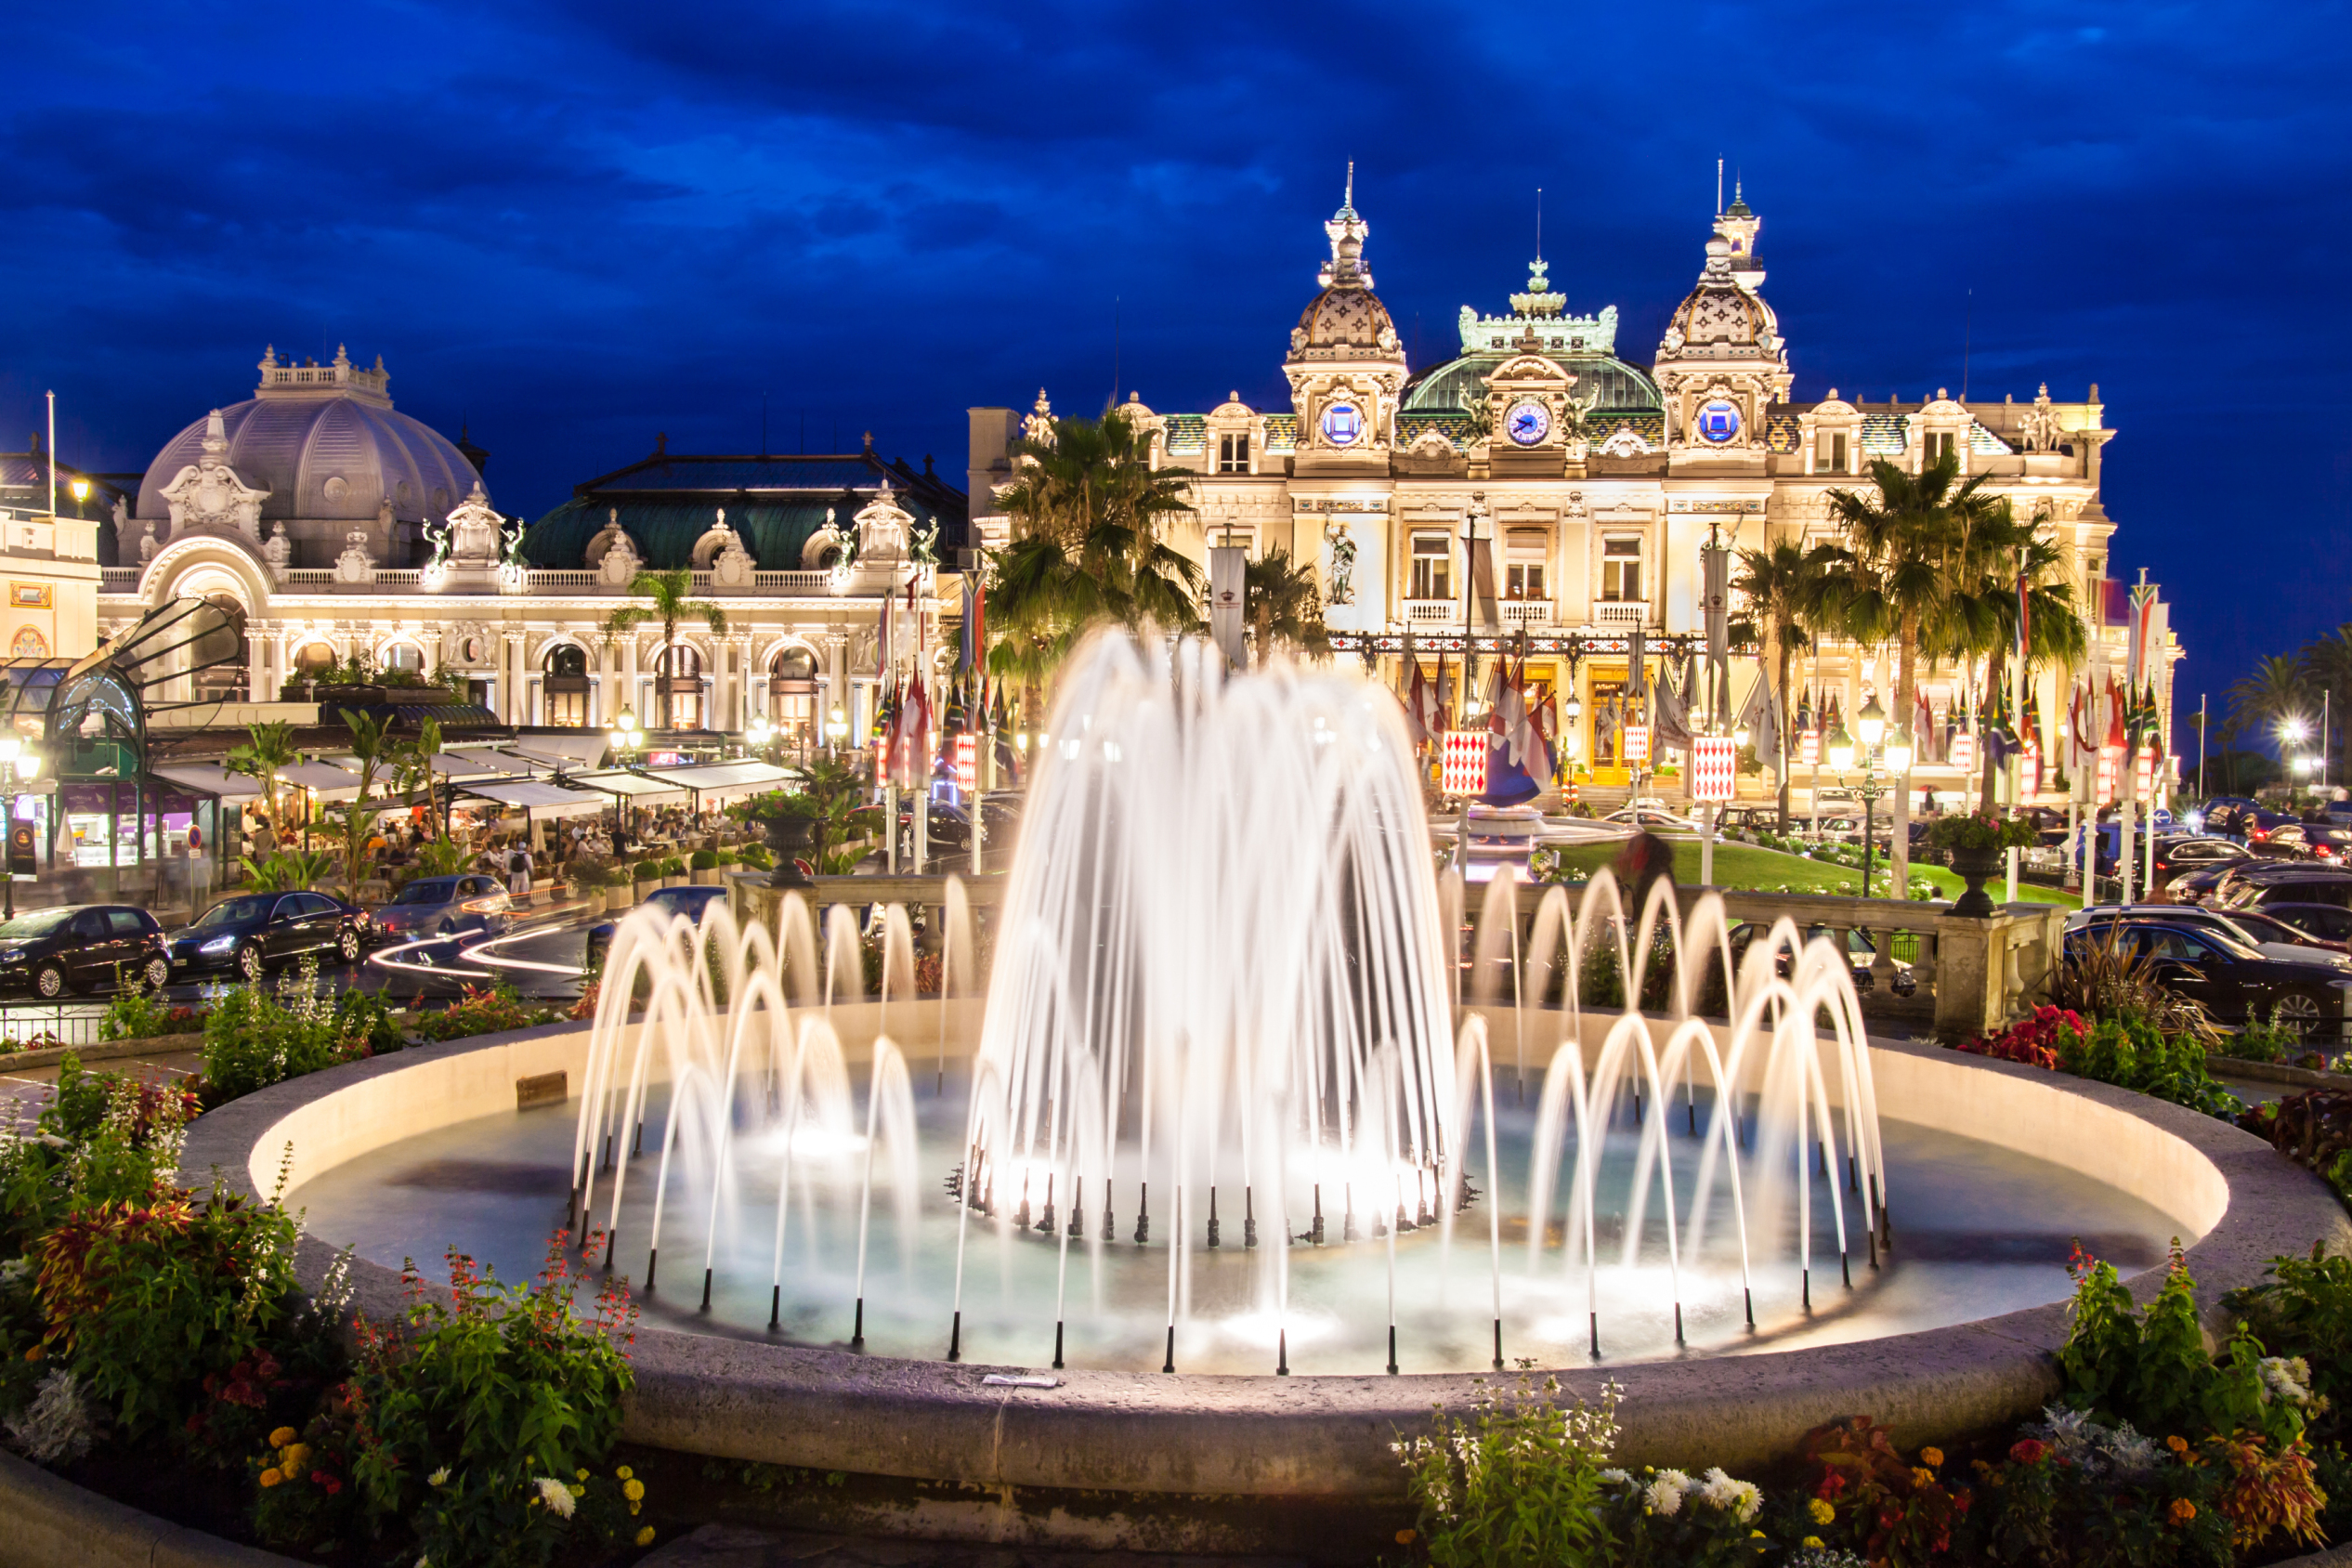 Monte Carlo Casino >> Casino De Monte Carlo Monaco Monaco Monaco Lonely Planet